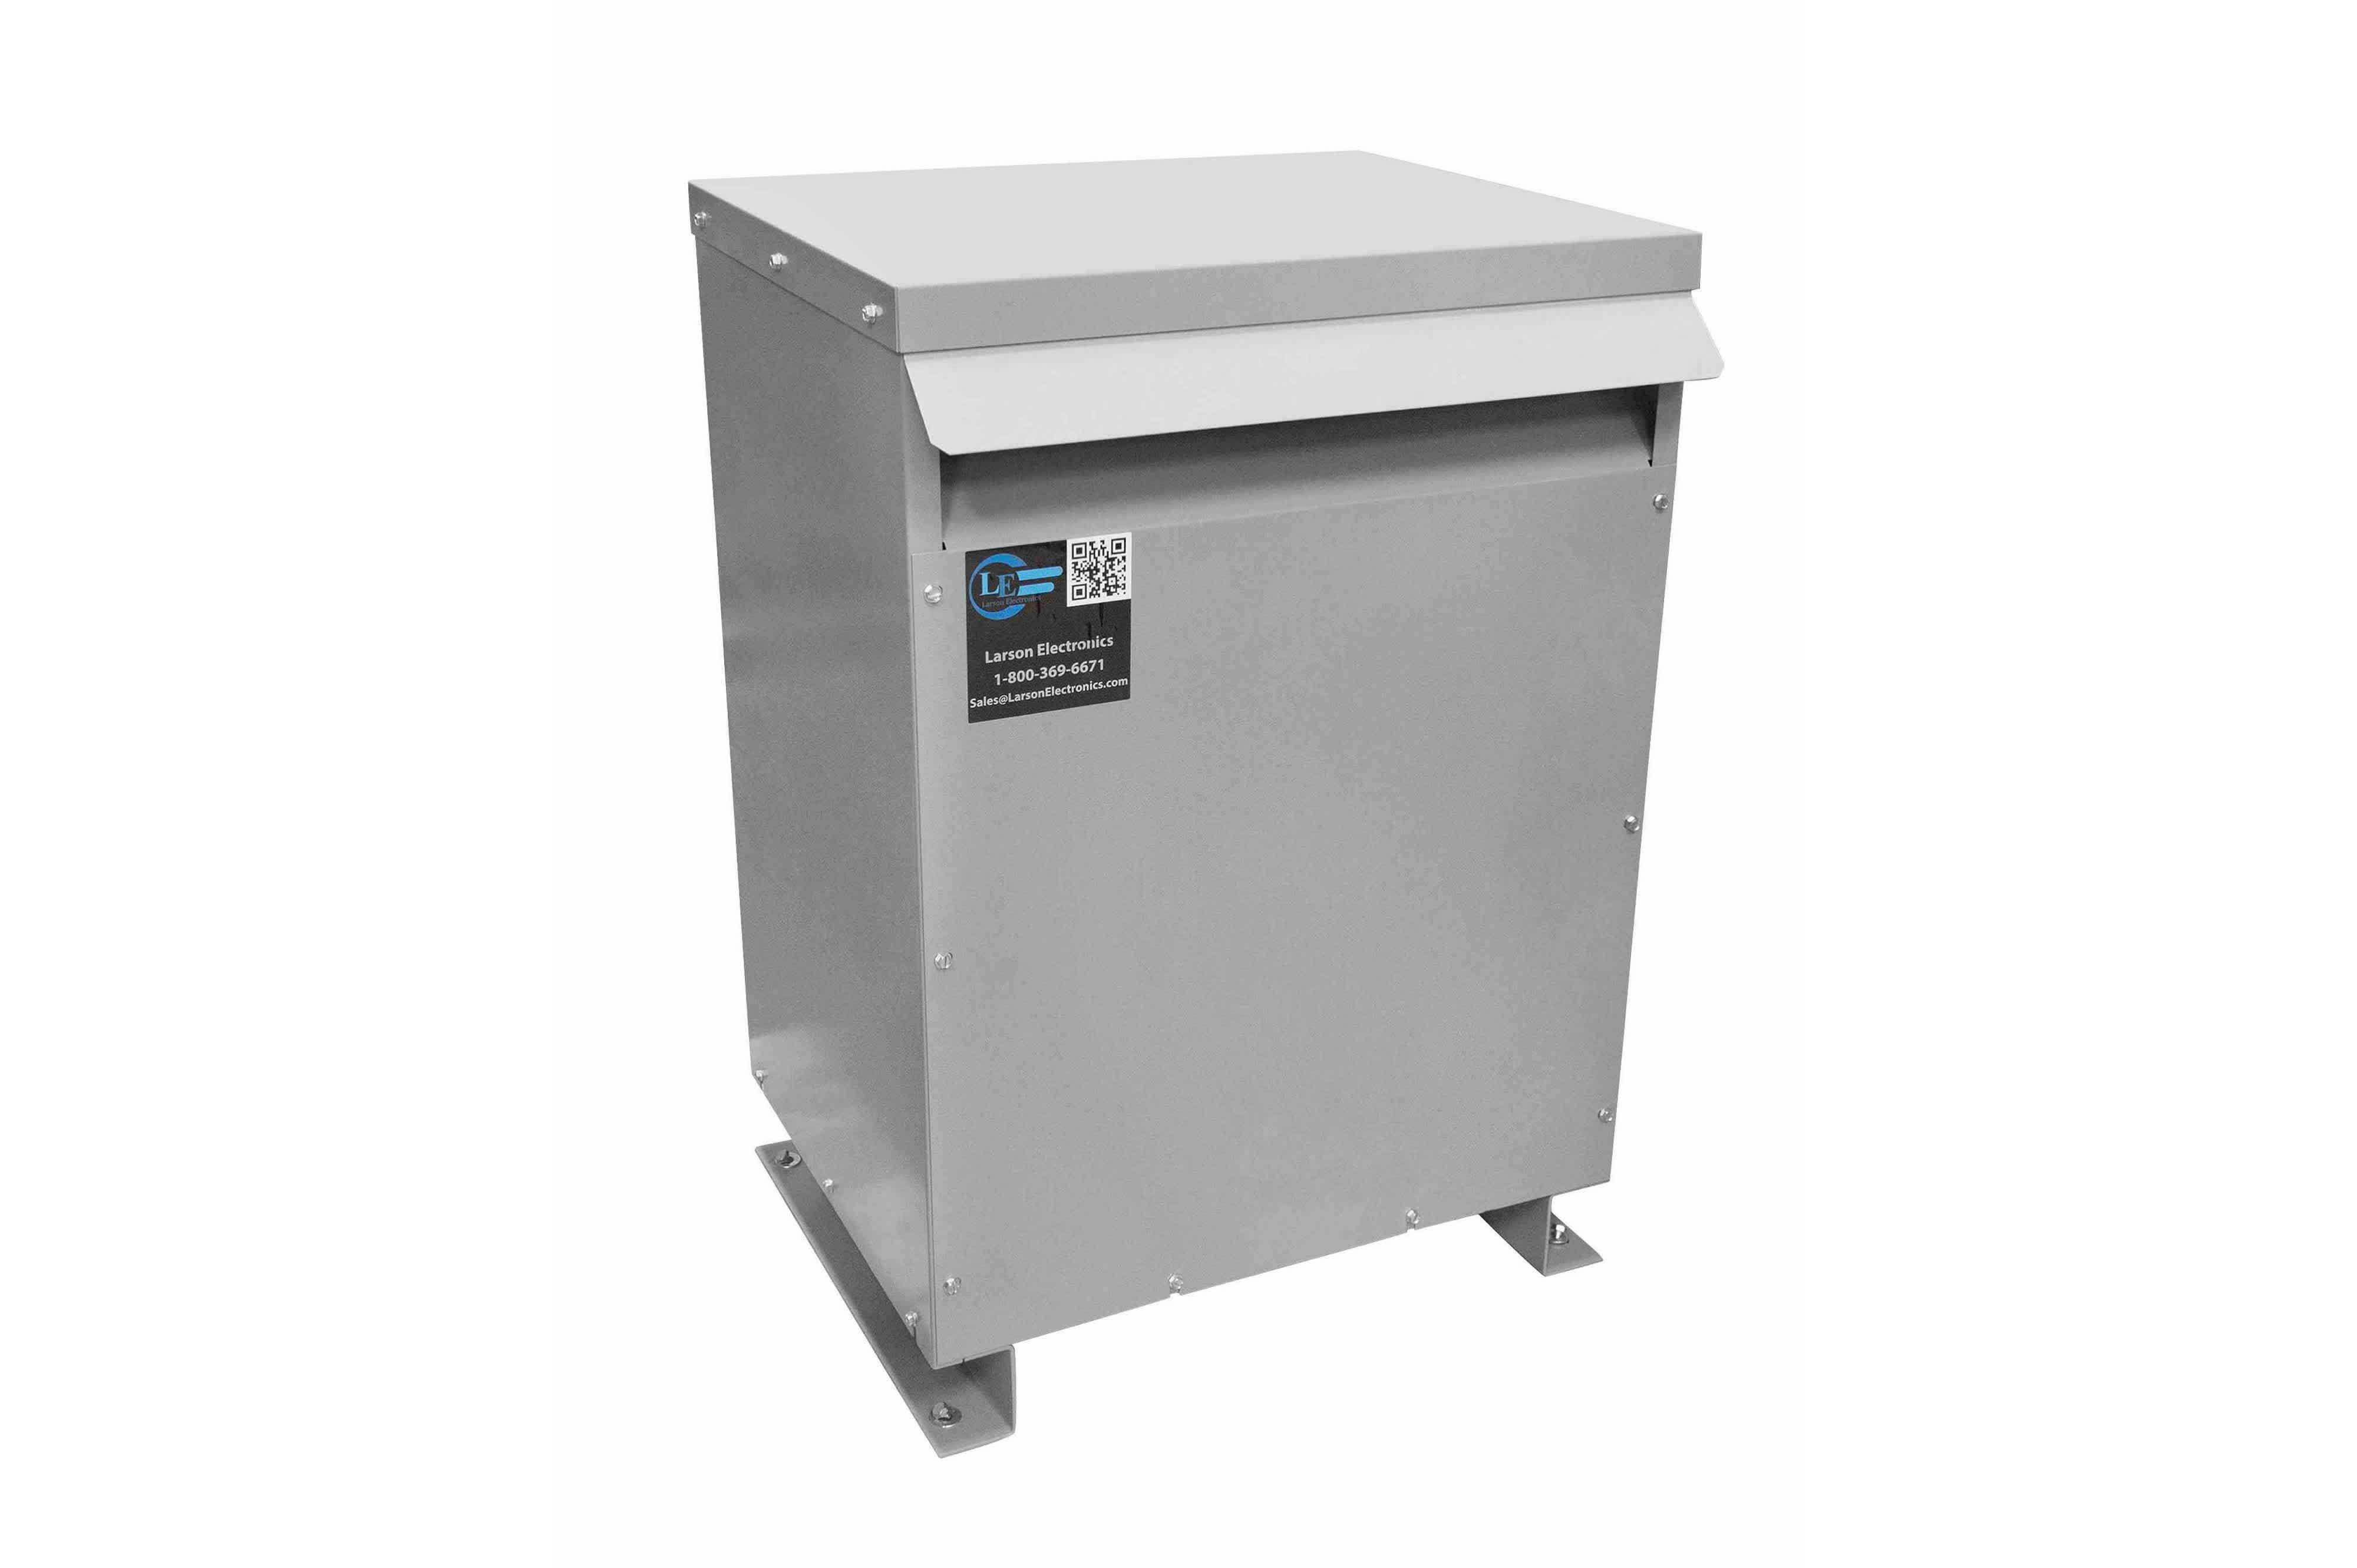 700 kVA 3PH Isolation Transformer, 415V Wye Primary, 240V/120 Delta Secondary, N3R, Ventilated, 60 Hz